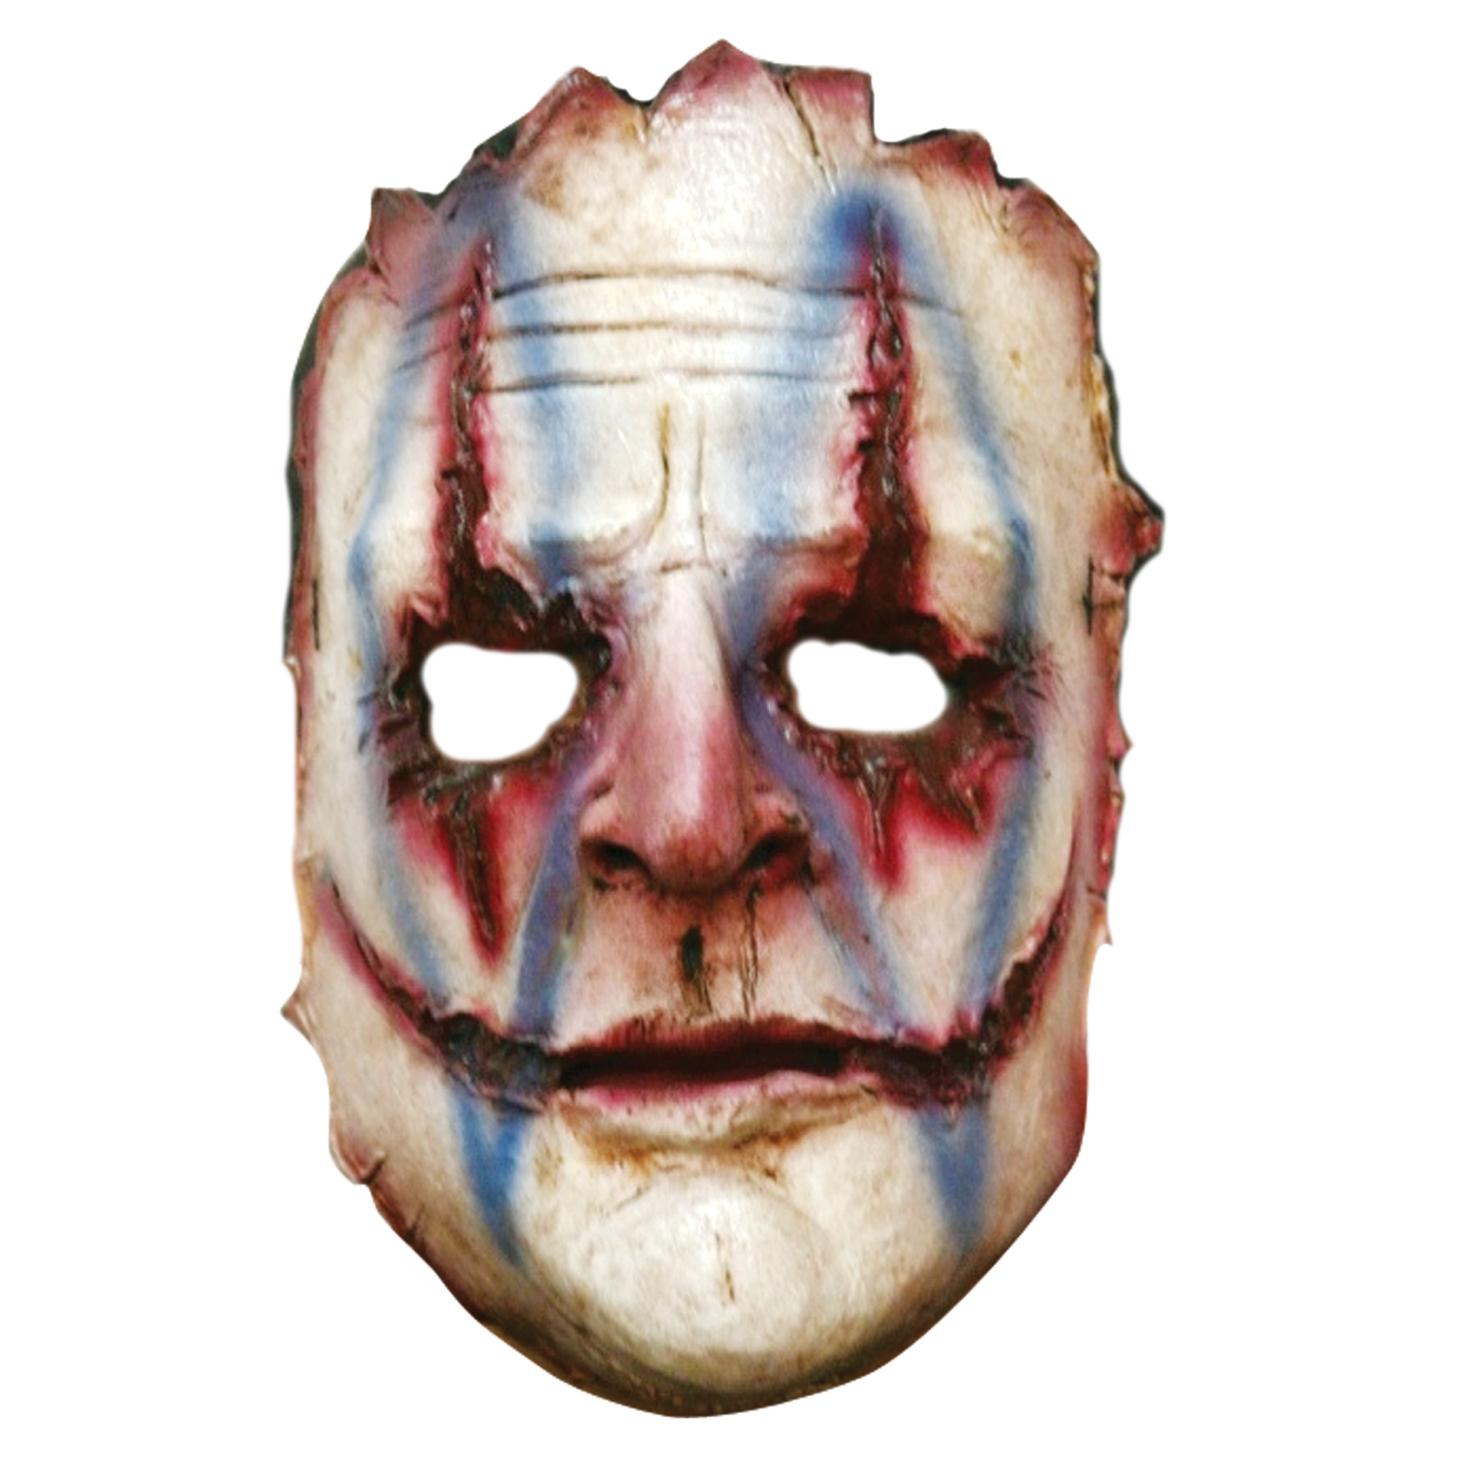 Serial Killer Skin Mask 4   masken   Pinterest   Skin mask and Masking